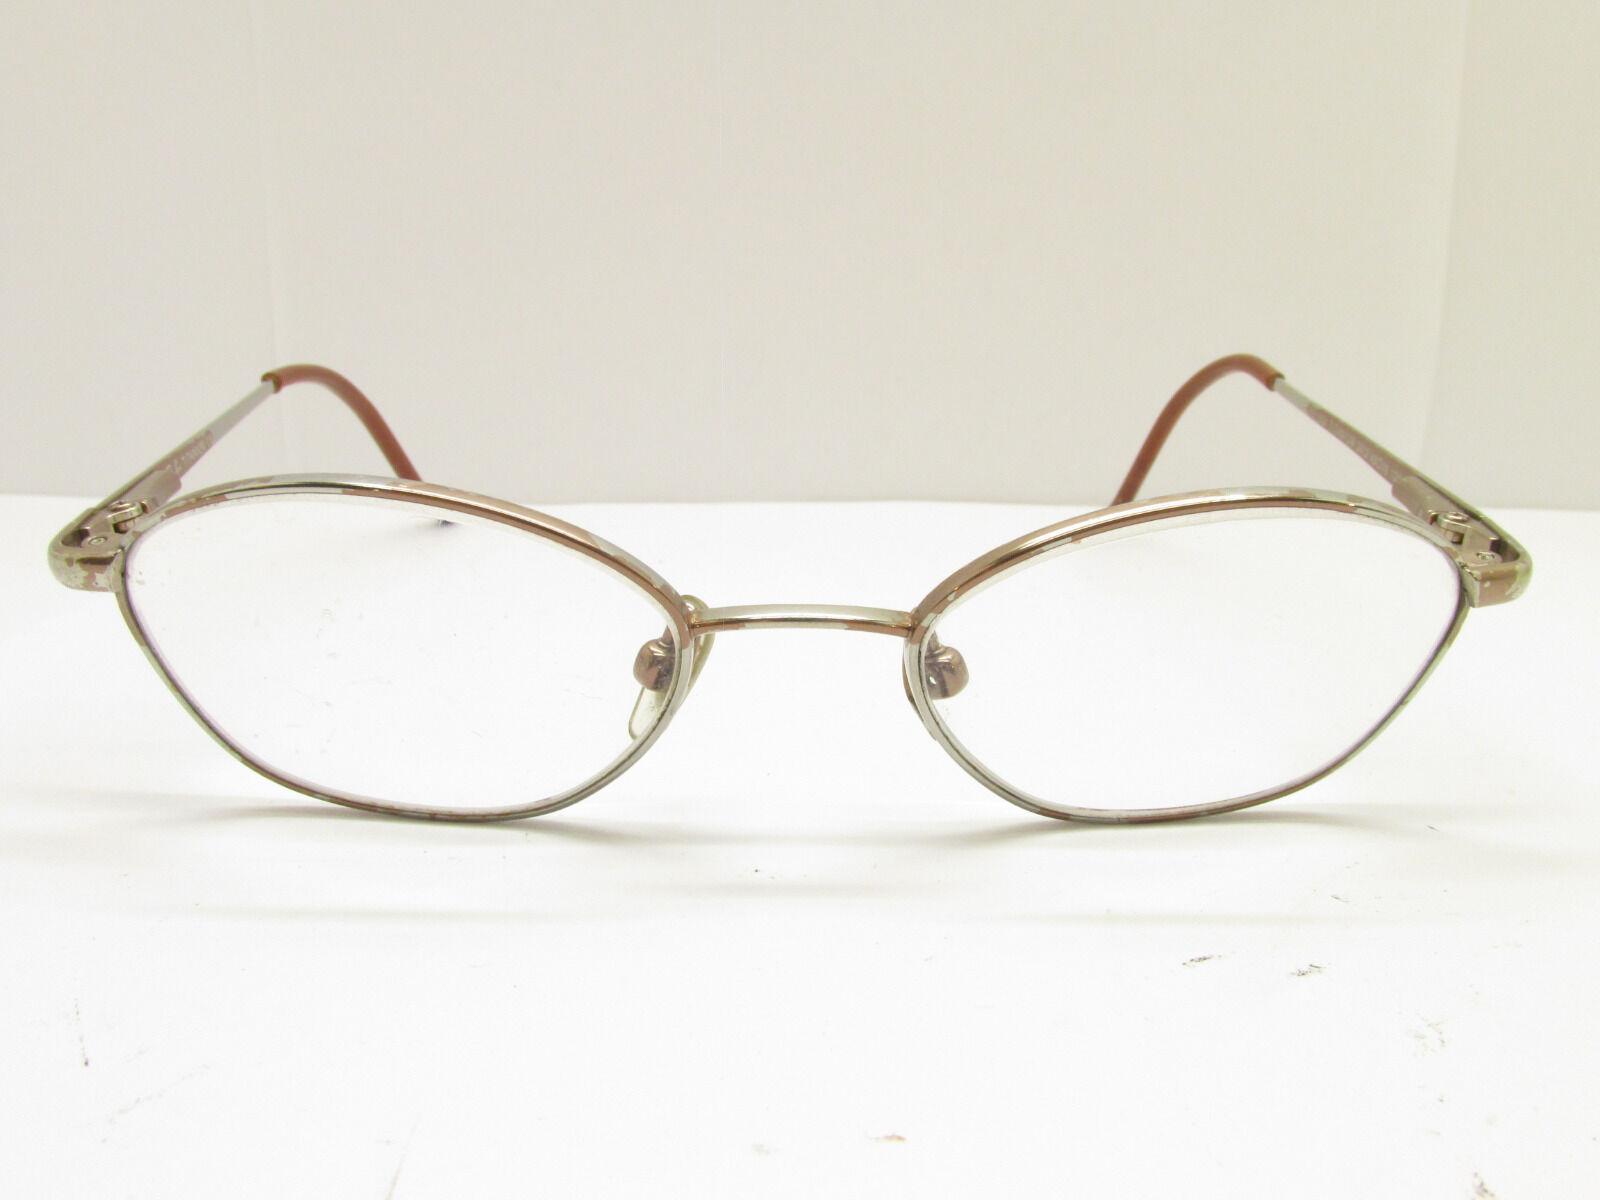 Ray-Ban RB1004 Kids Titanium Eyeglasses Eyewear Frames 43-16-120 Tv2 ...